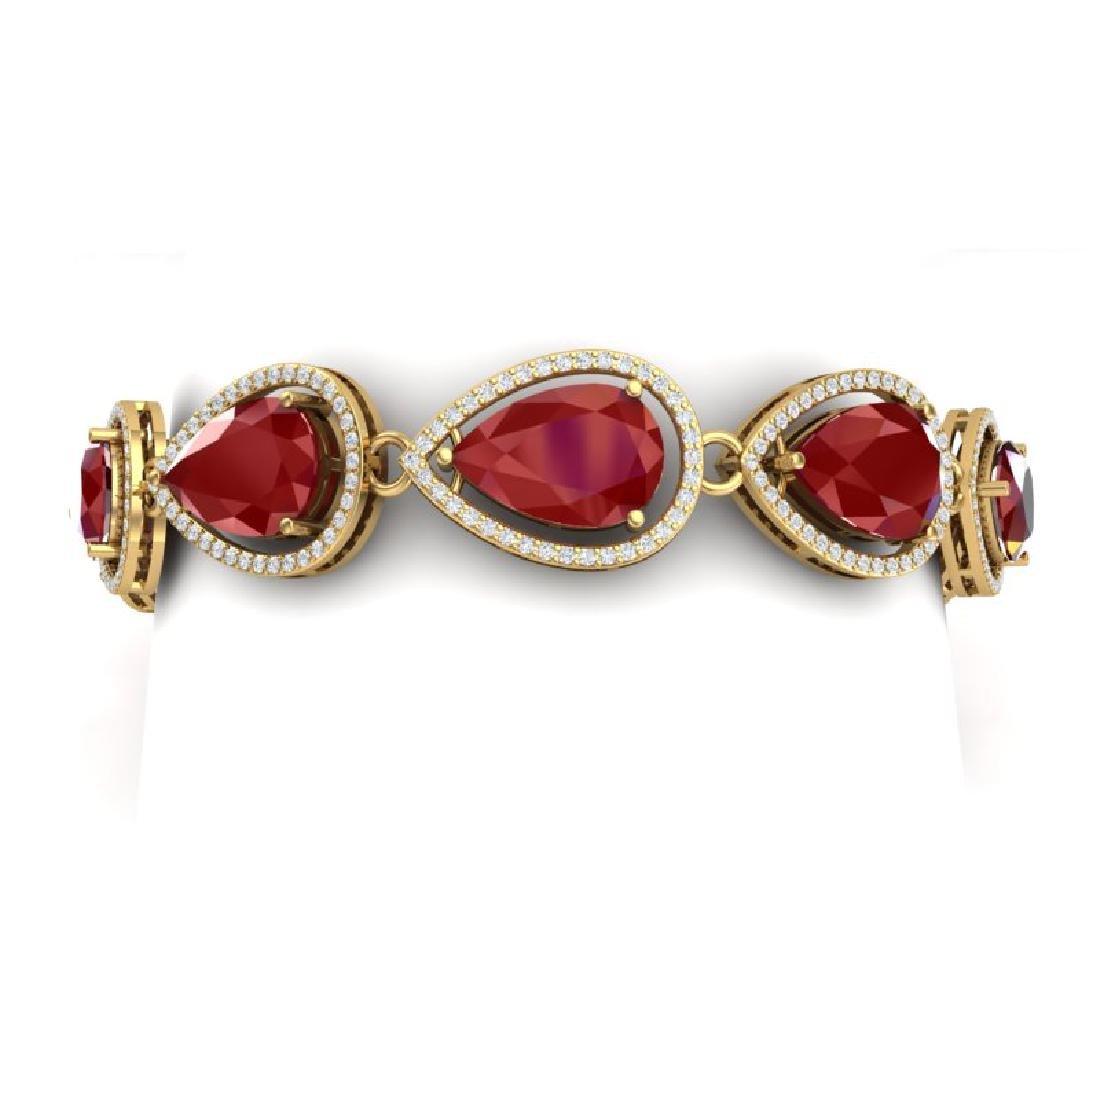 28.31 CTW Royalty Ruby & VS Diamond Bracelet 18K Yellow